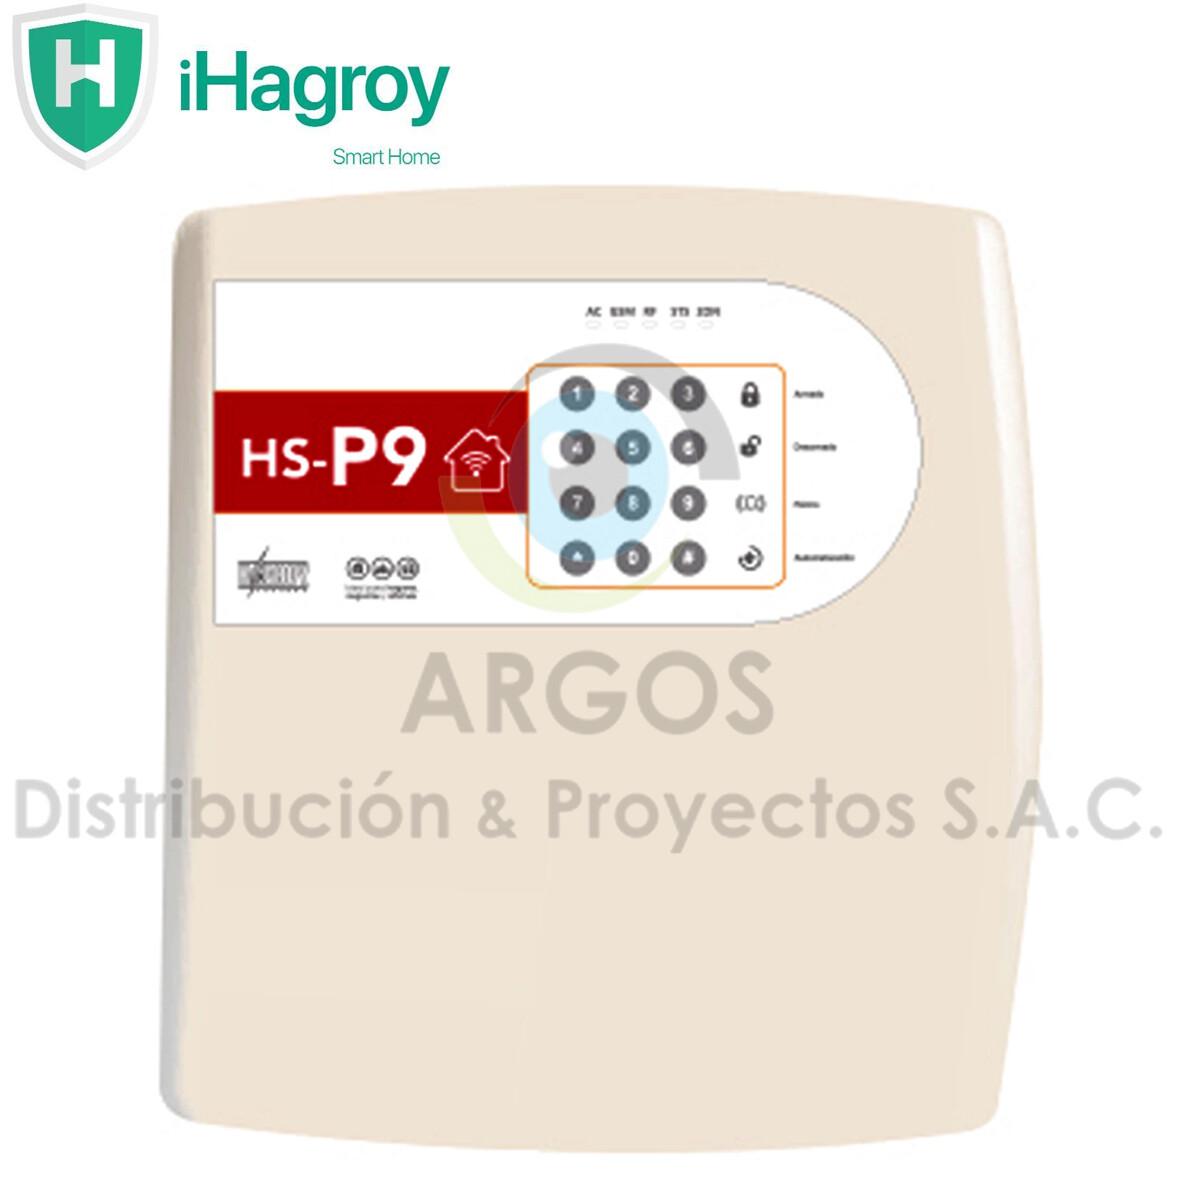 PANEL SMART HAGROY P9 MANUALES